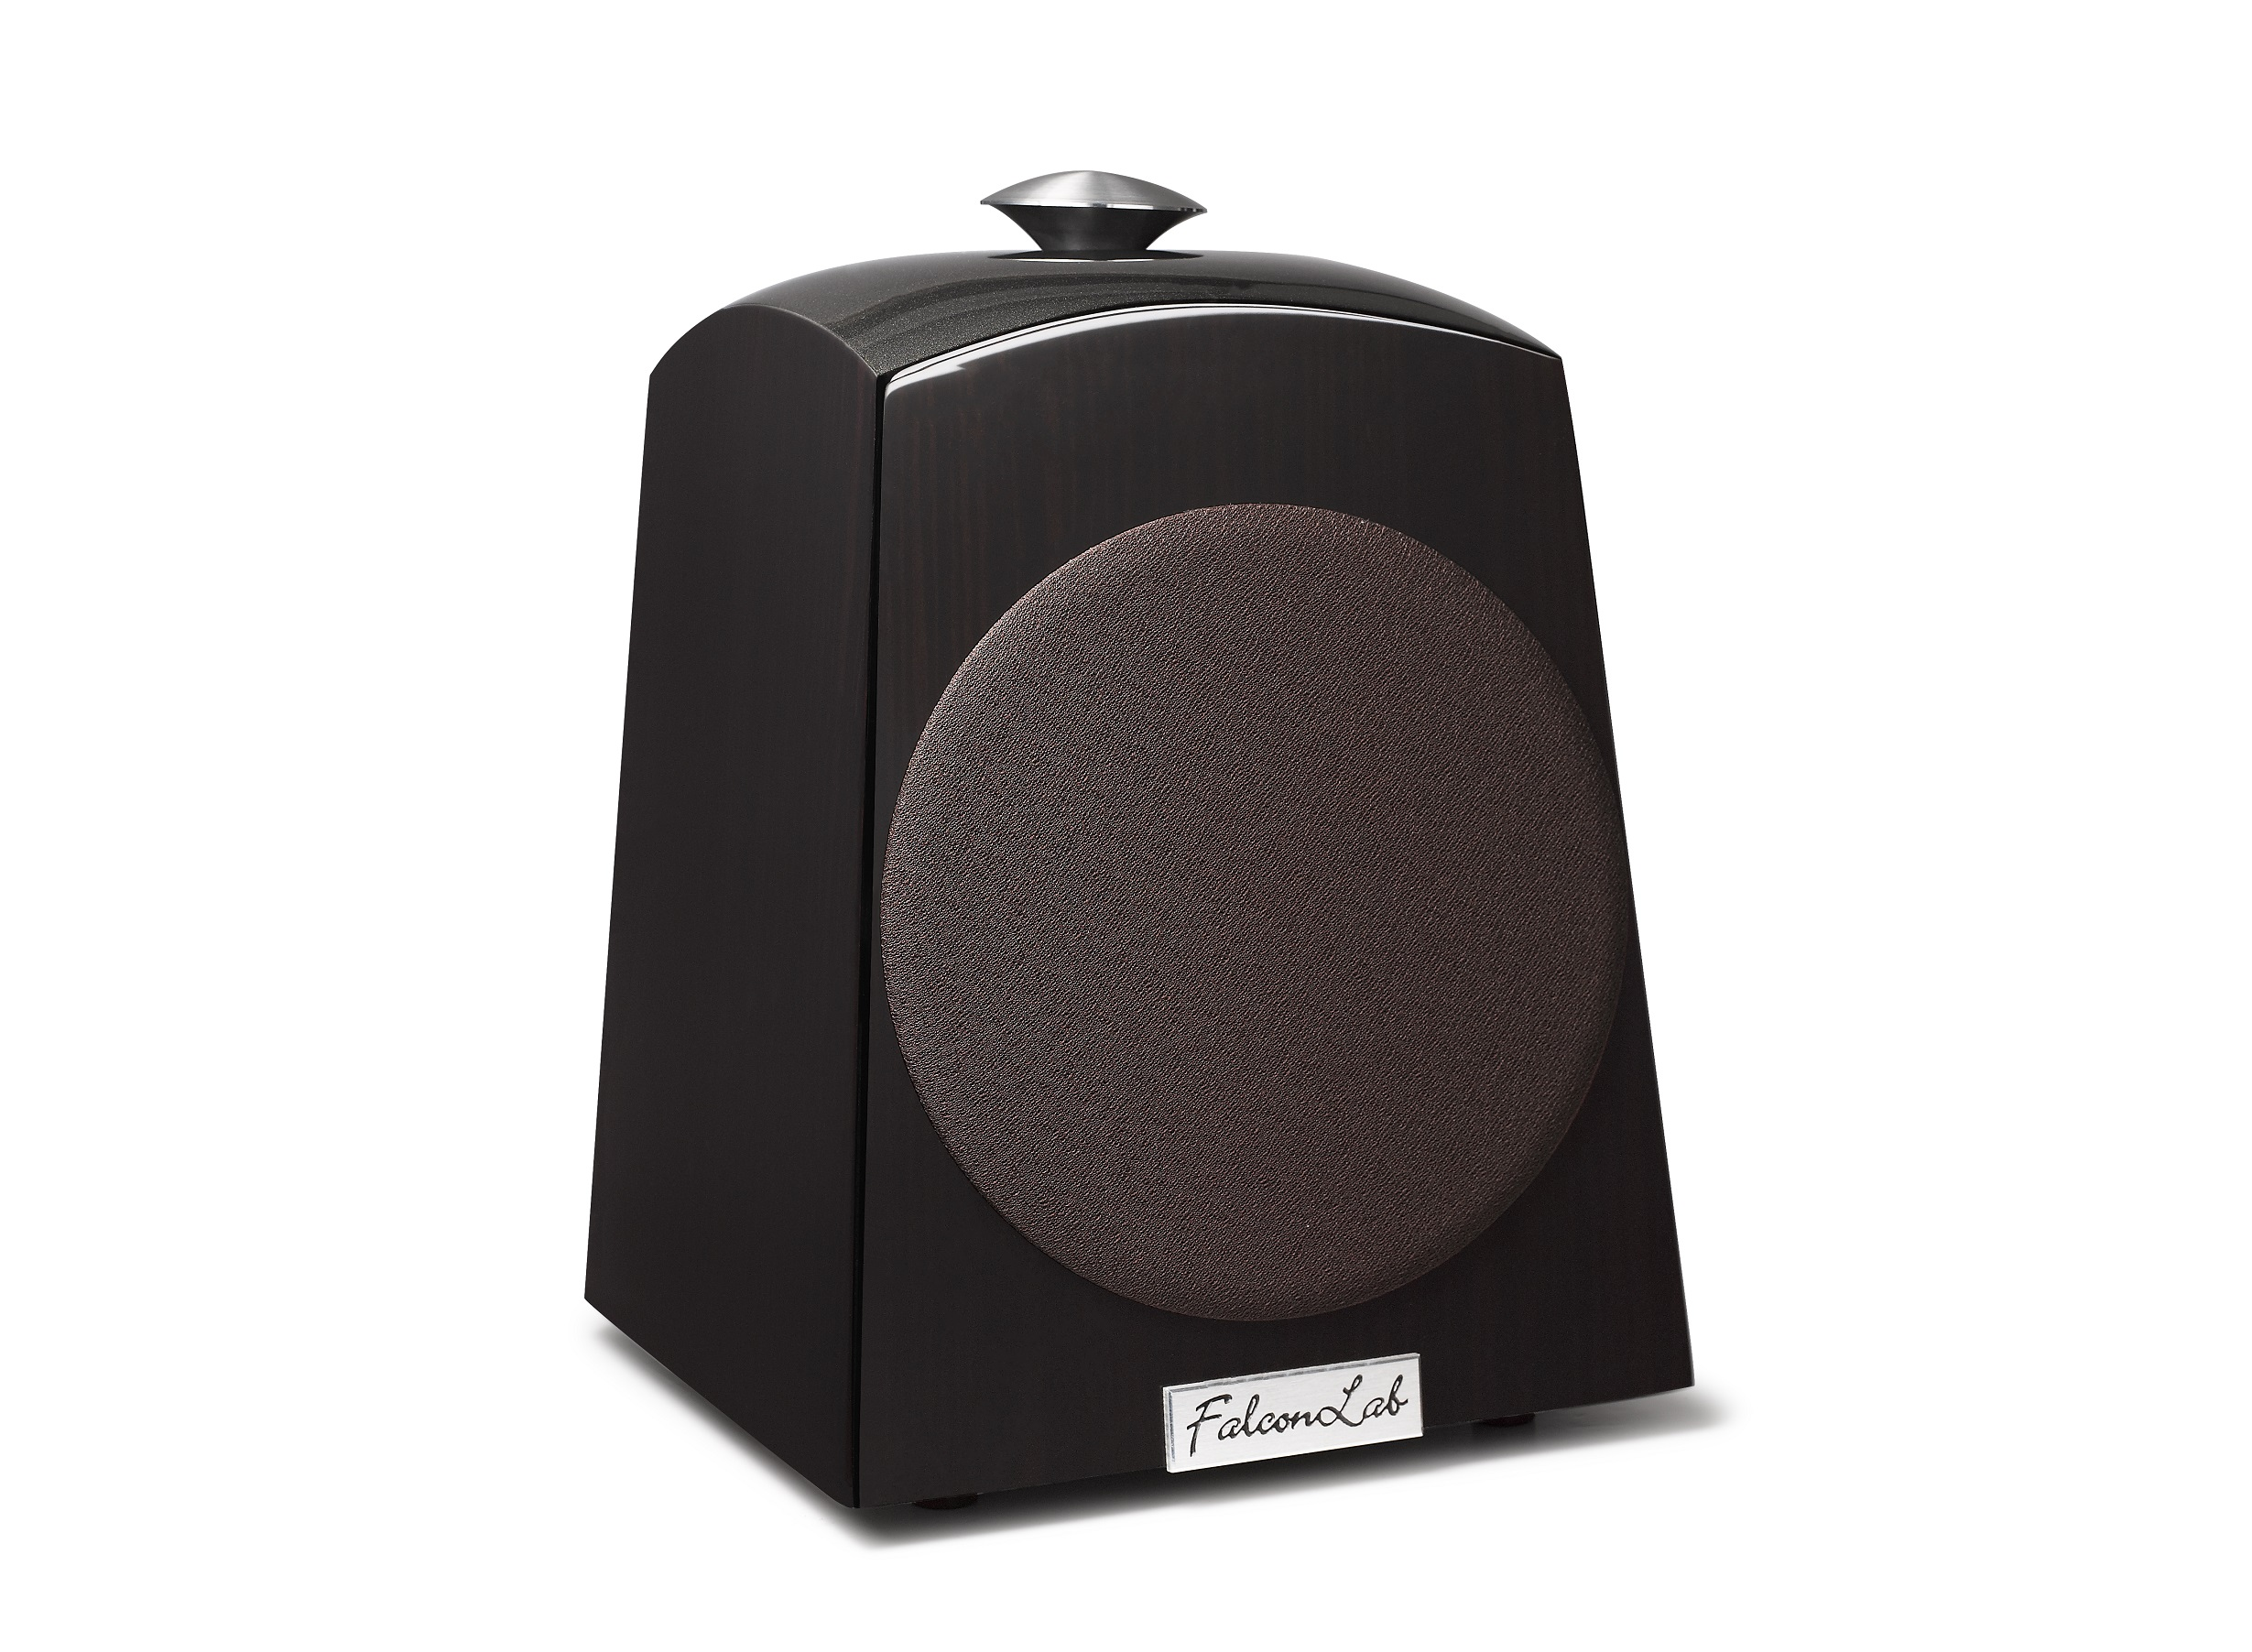 FalconLab Model201WG 全指向性スピーカーシステム (木目調ピアノ黒塗装)